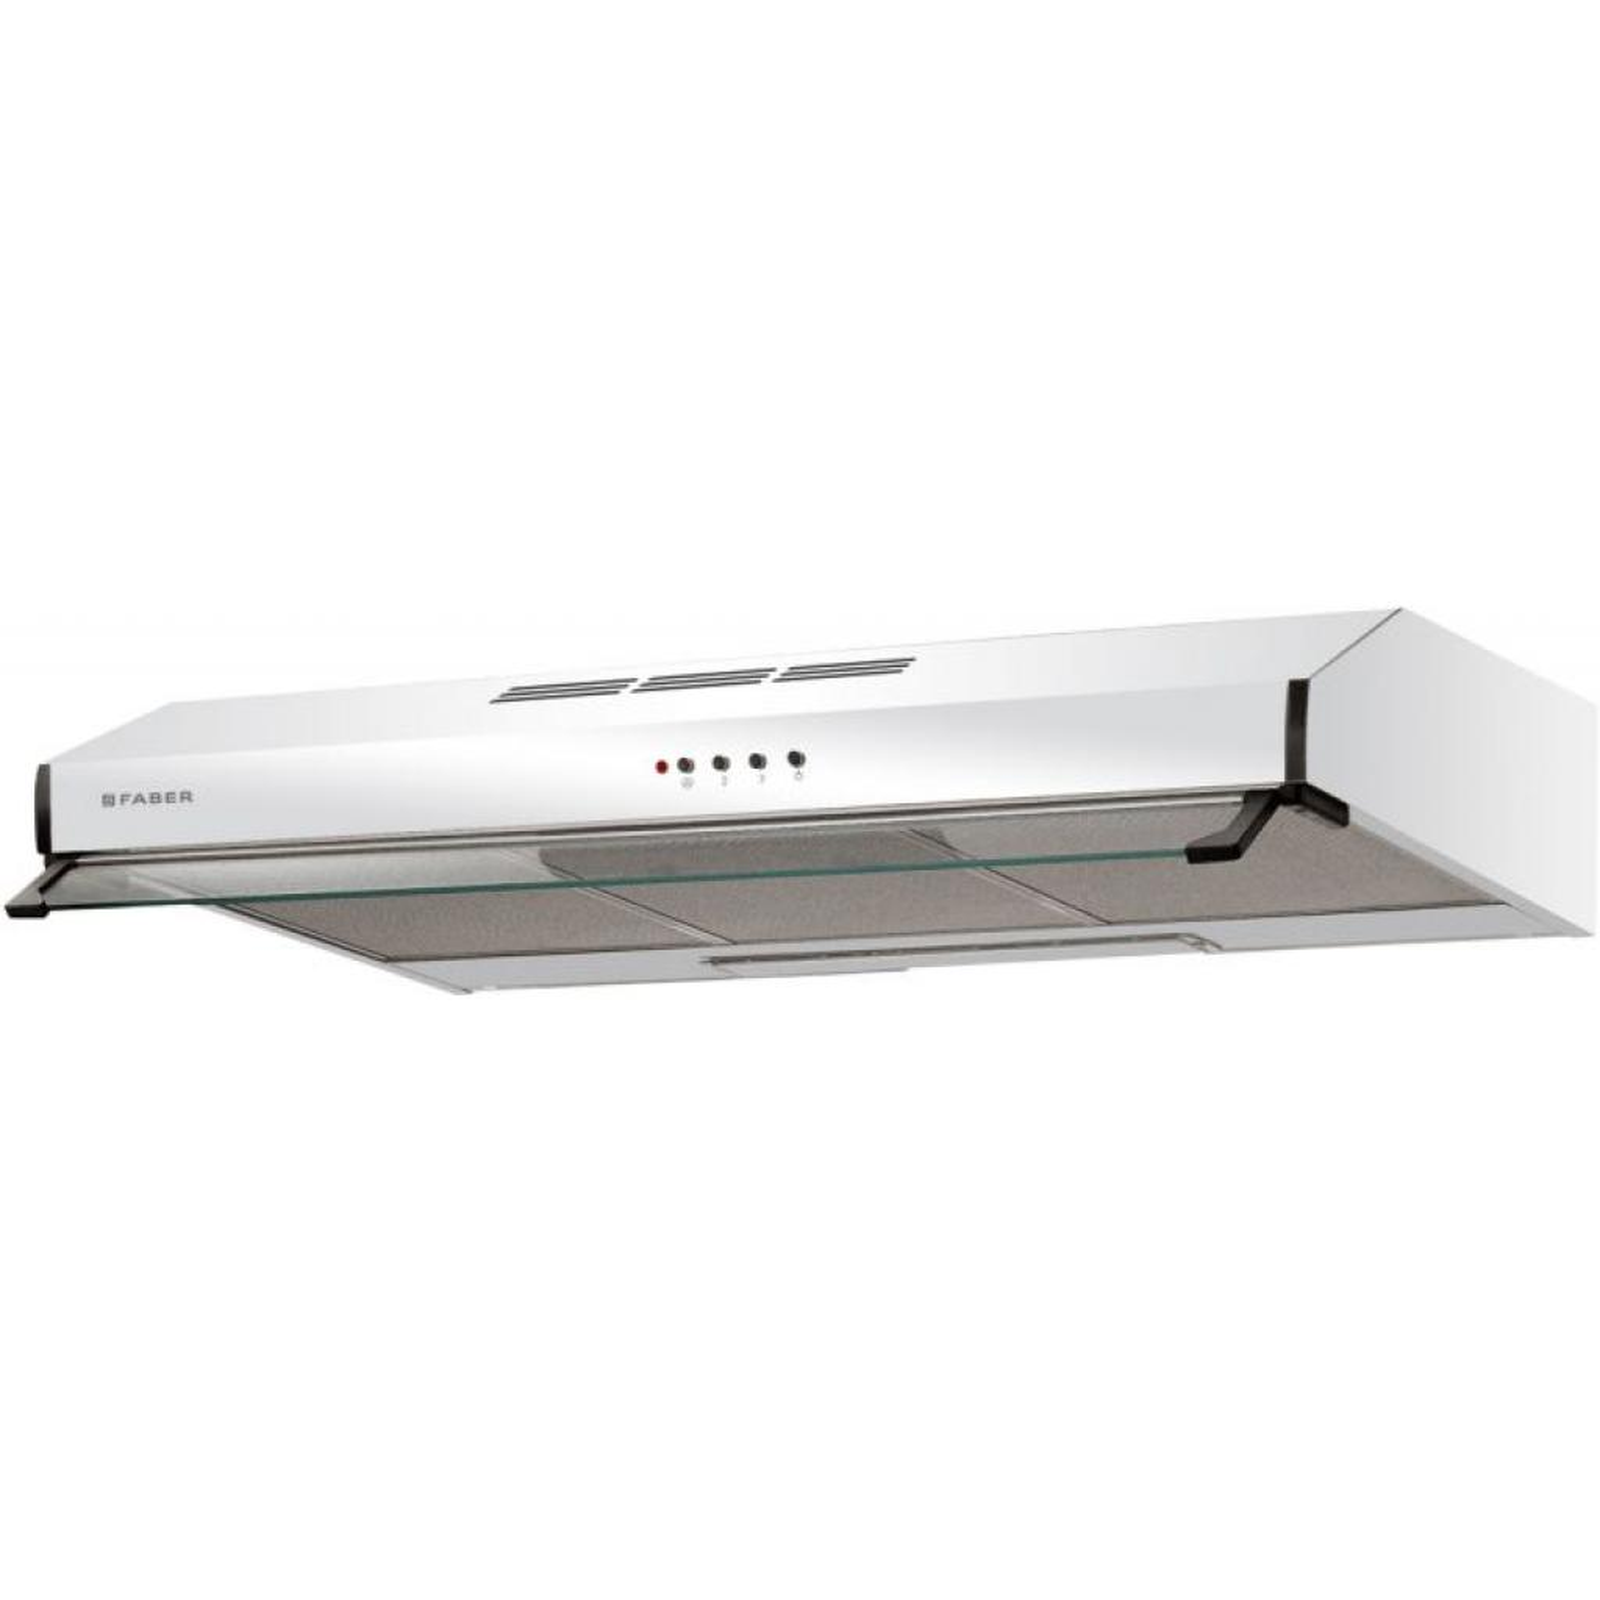 Вытяжка кухонная Faber 741 A60 W Plus